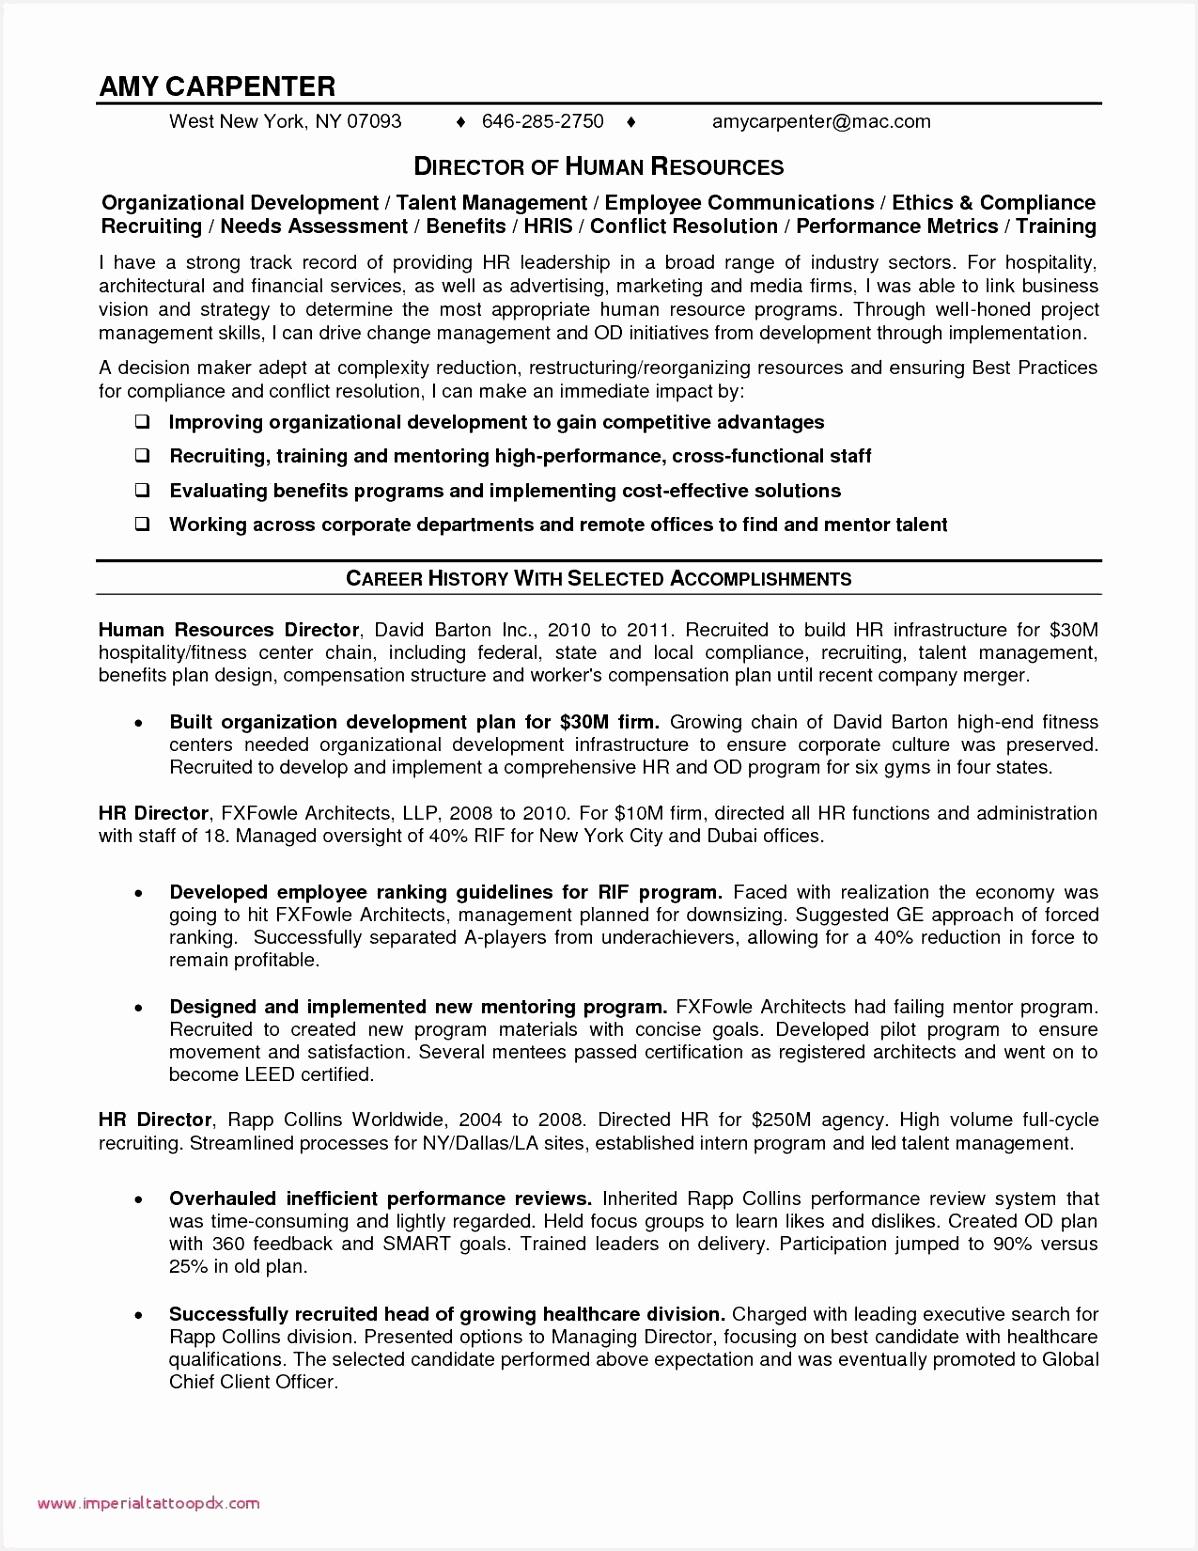 Sample Resume Objective Statements Bank Teller Entry Level Bank Teller Resume Harmonious Bank Teller Resume Sample 15511198h2hEhp